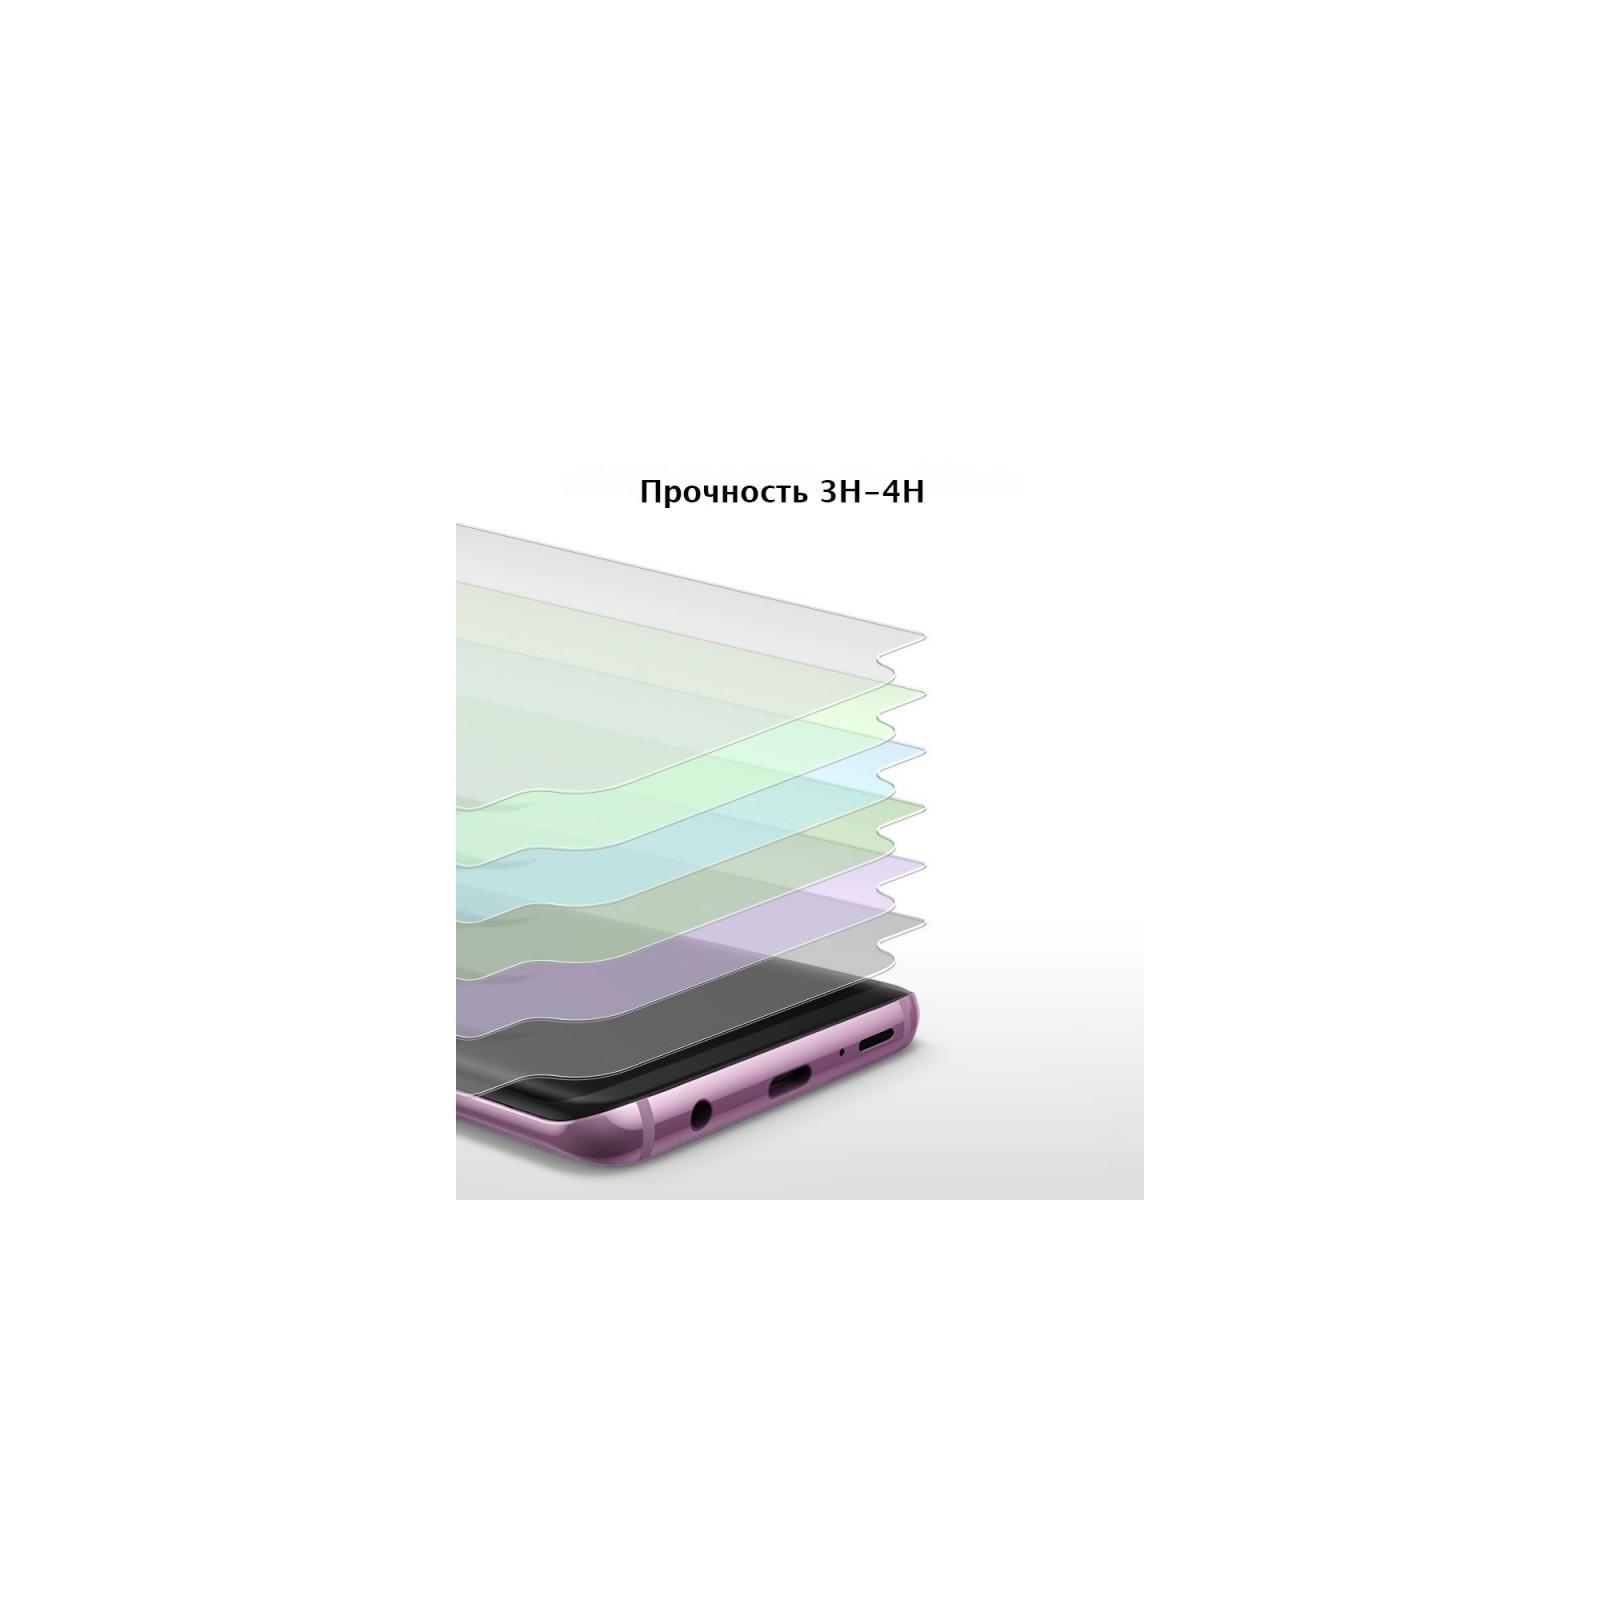 Пленка защитная Ringke для телефона Samsung Galaxy S9 Full Cover (RSP4427) изображение 3